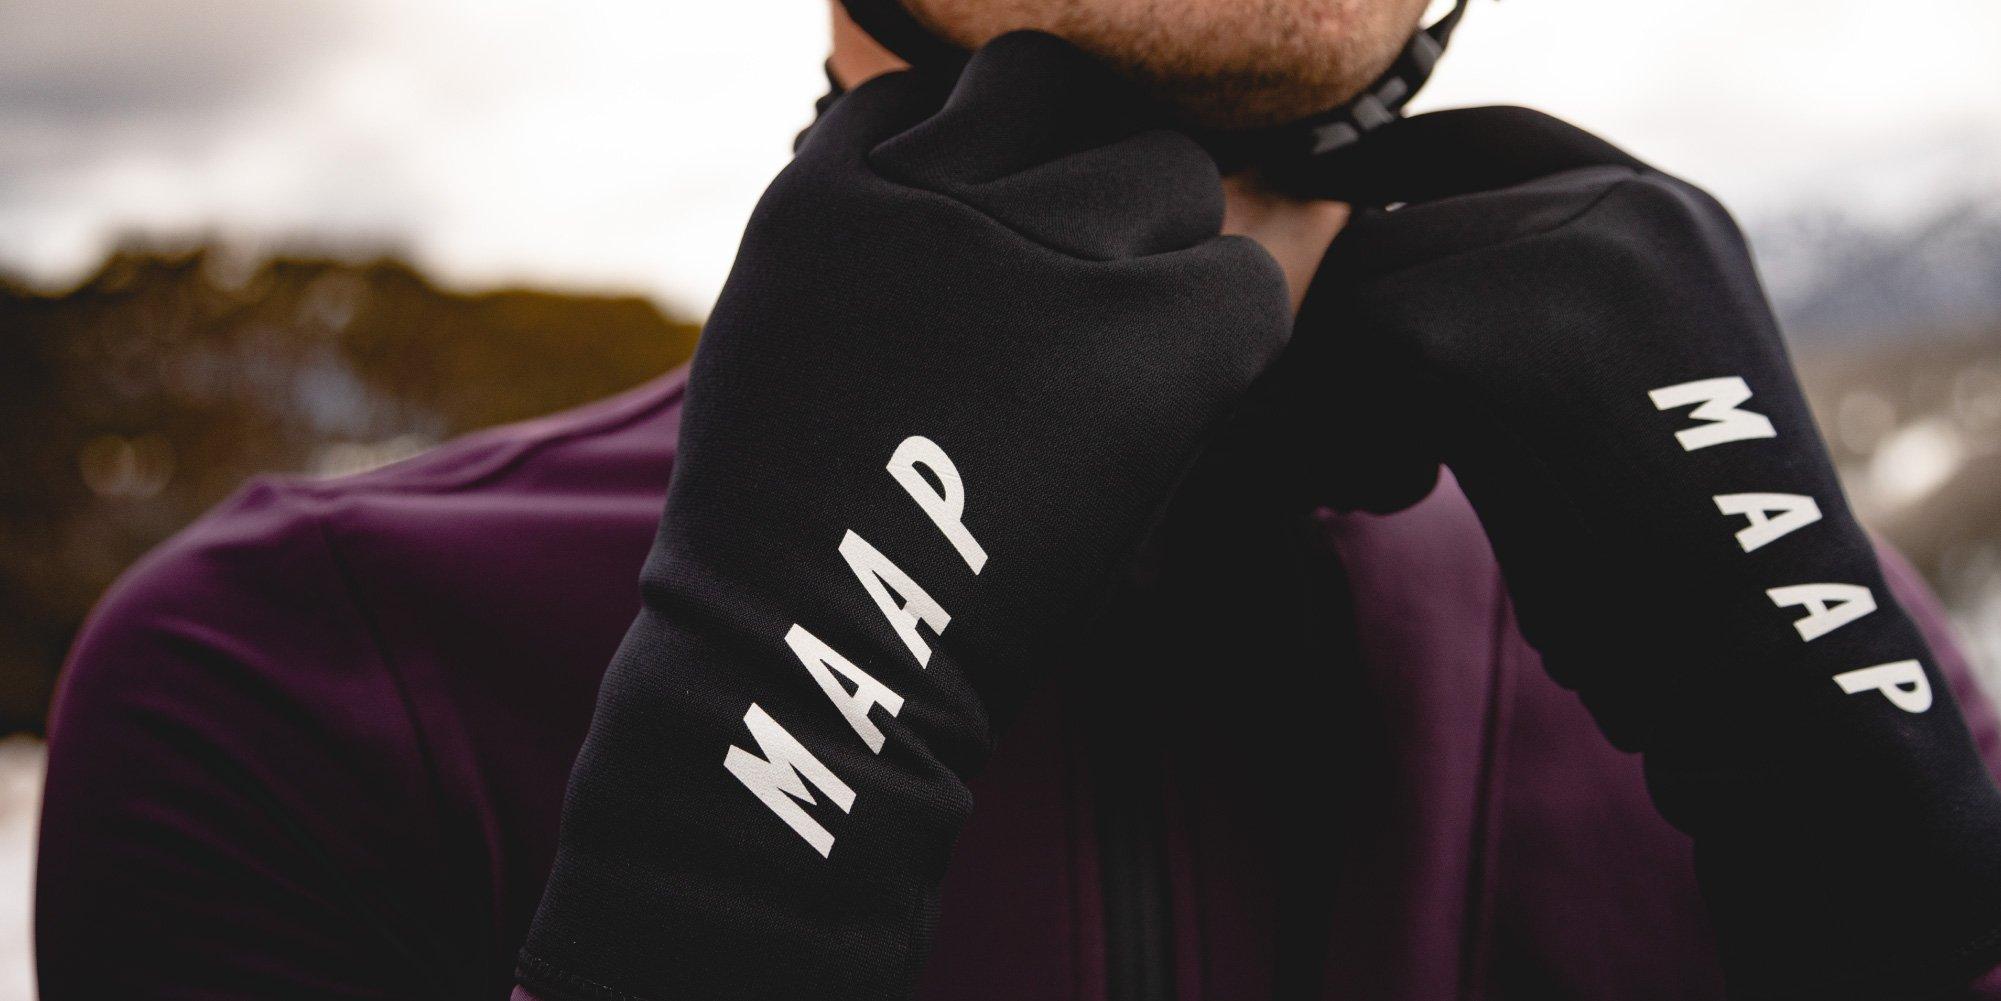 Deep Winter Neo Glove